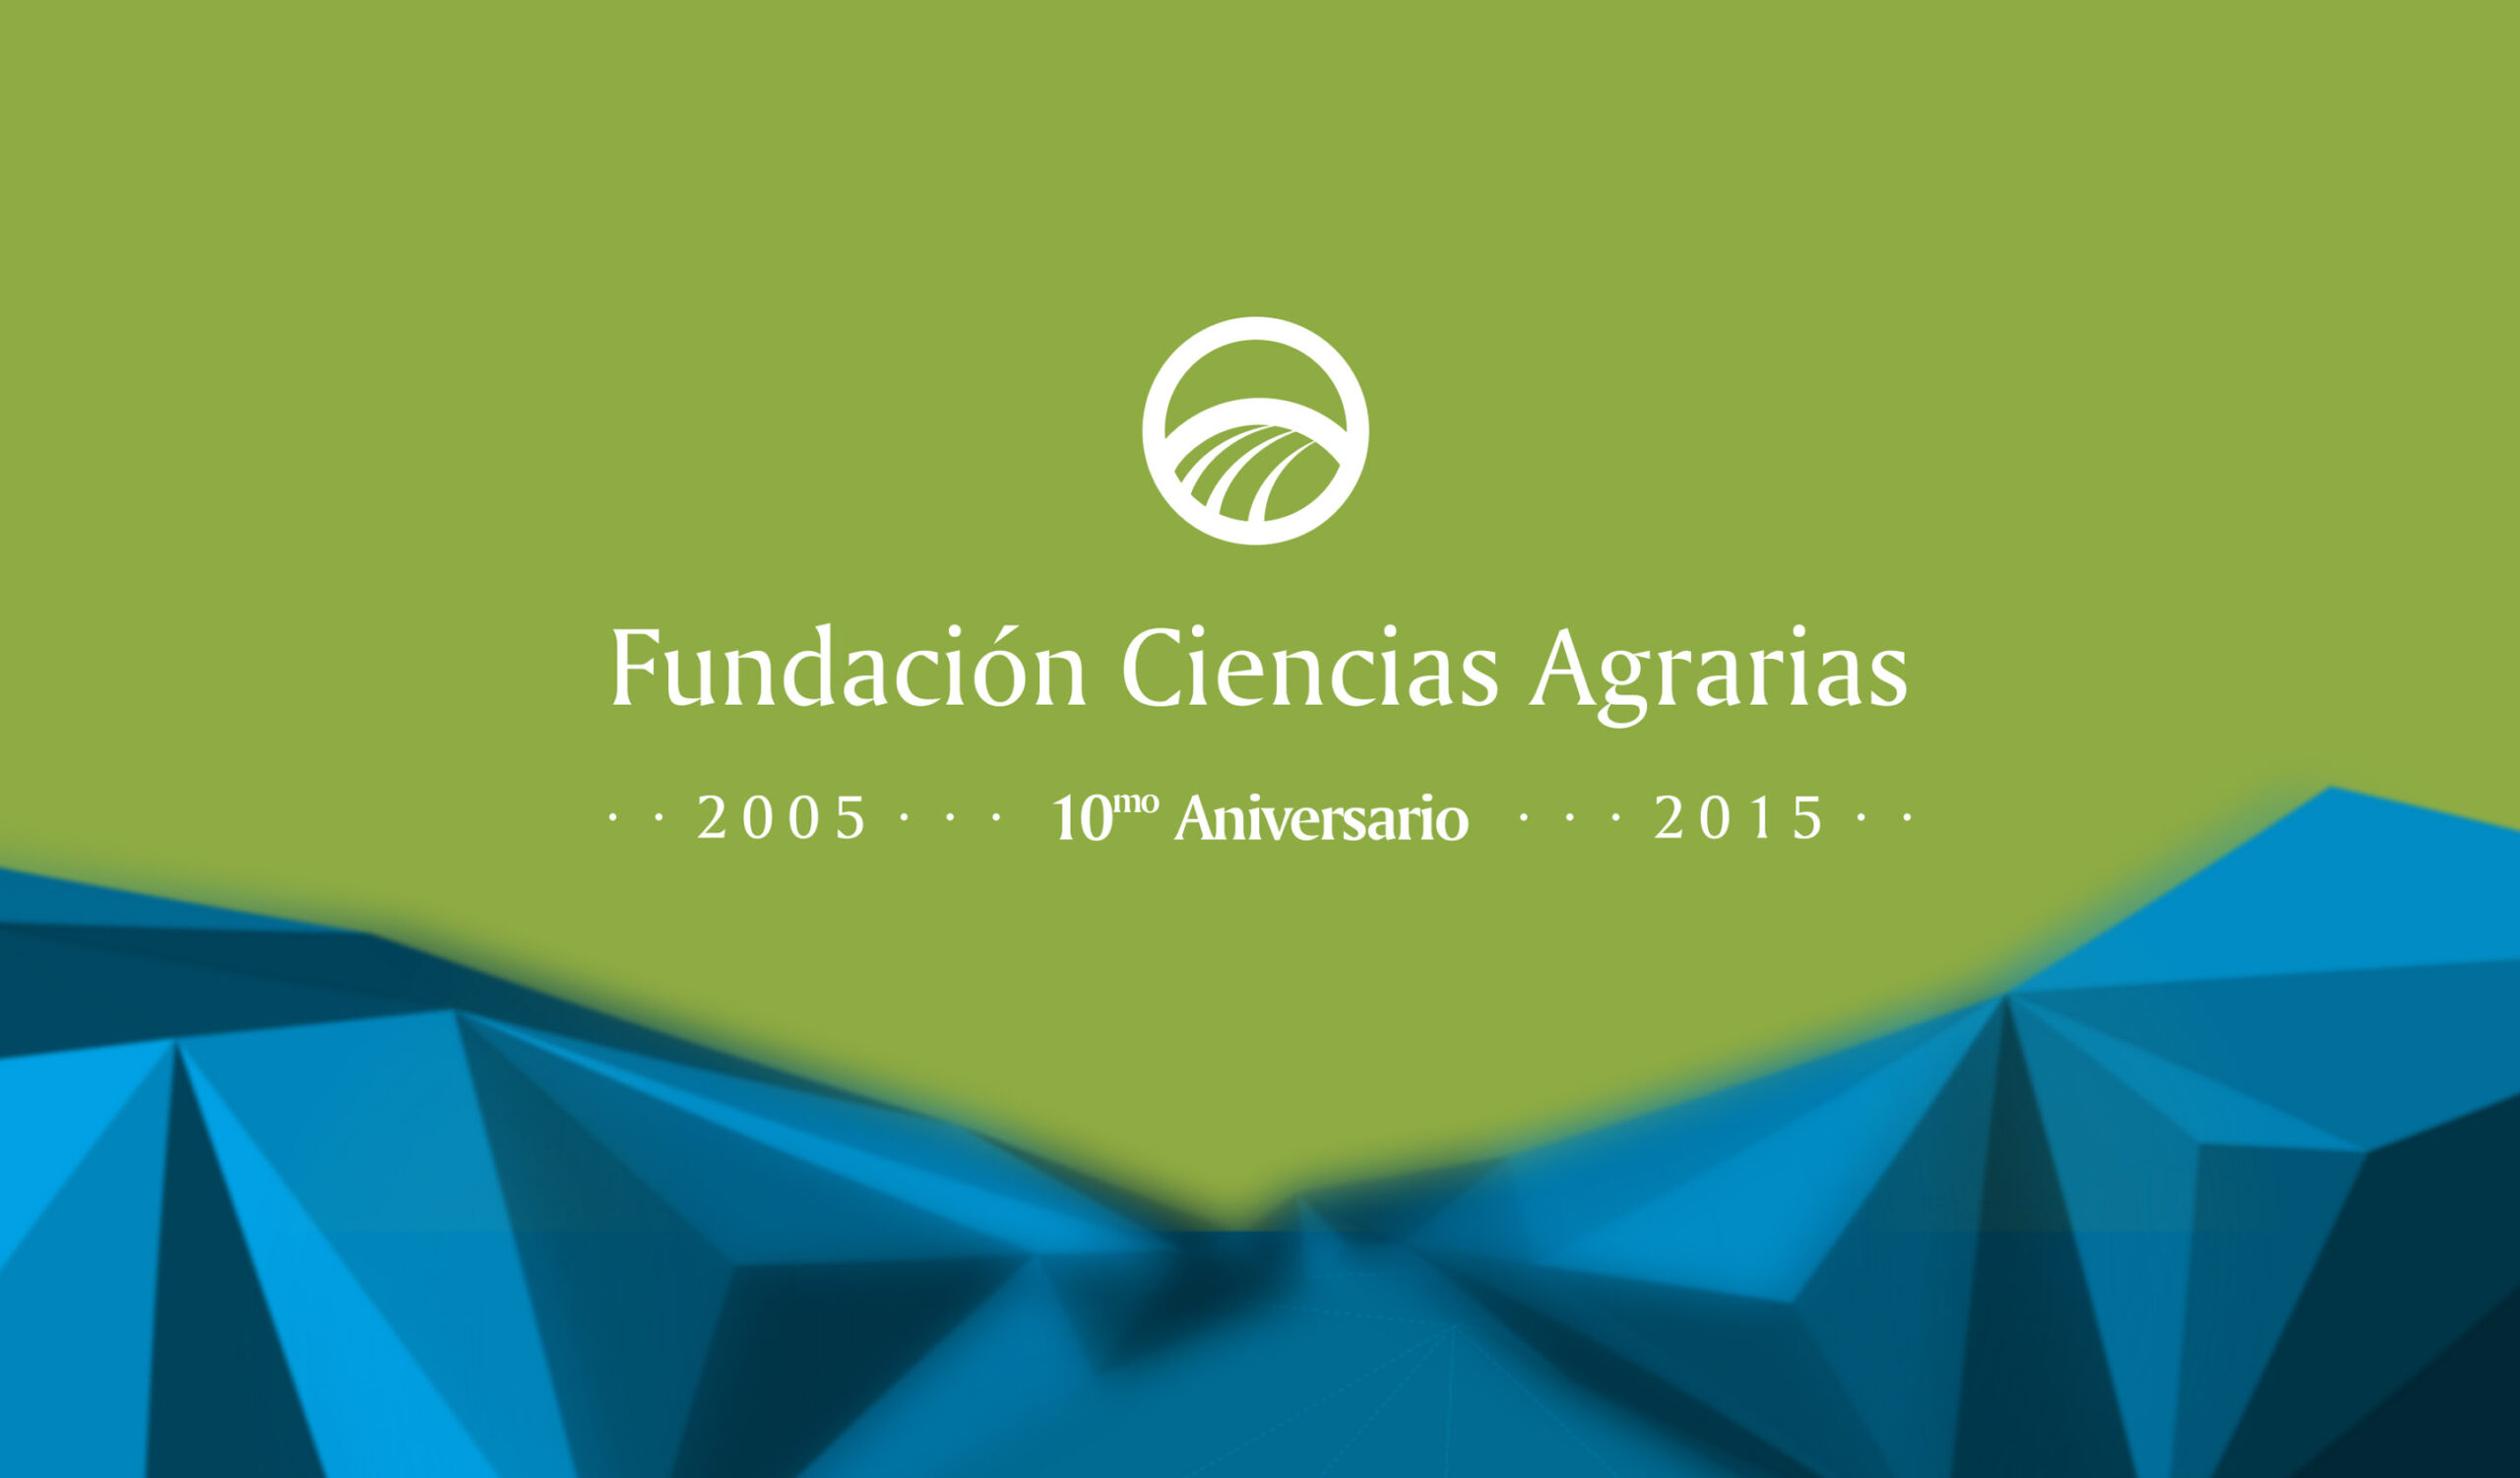 Fundación Ciencias Agrarias